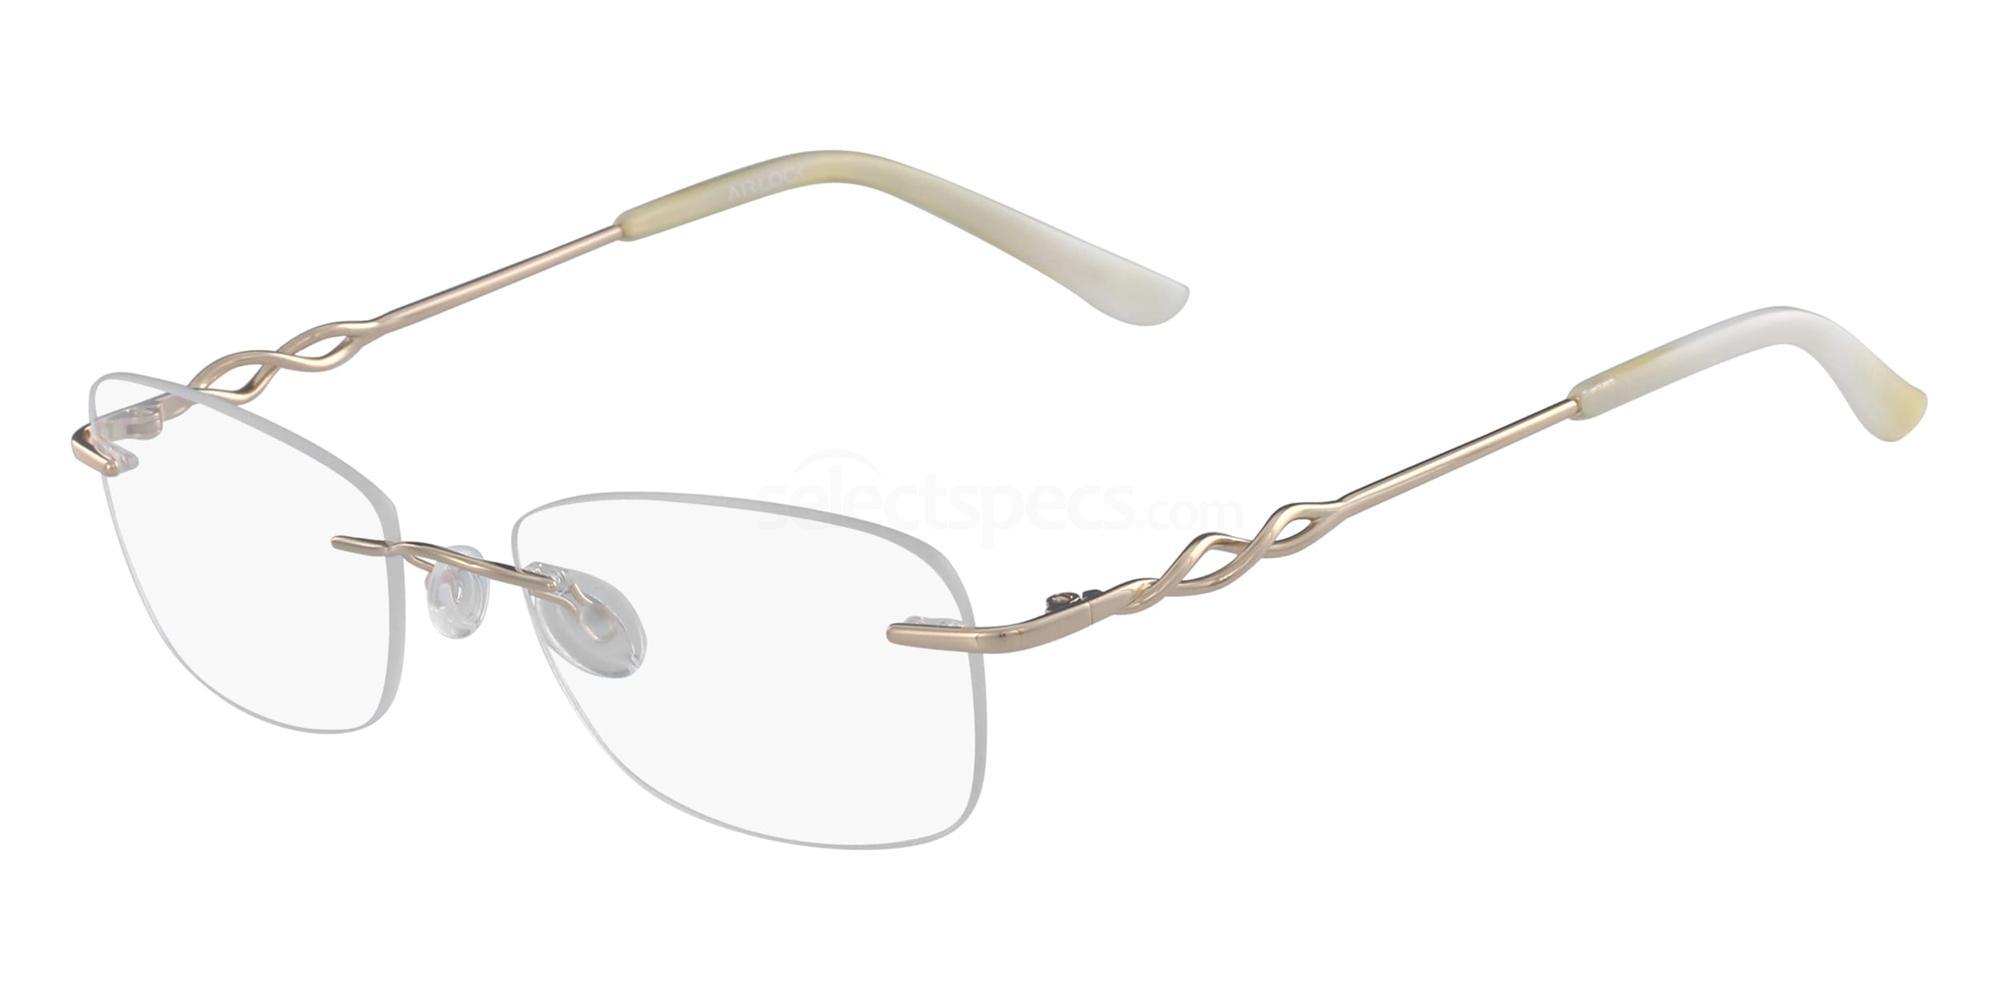 710 ESSENCE 203 Glasses, Pure